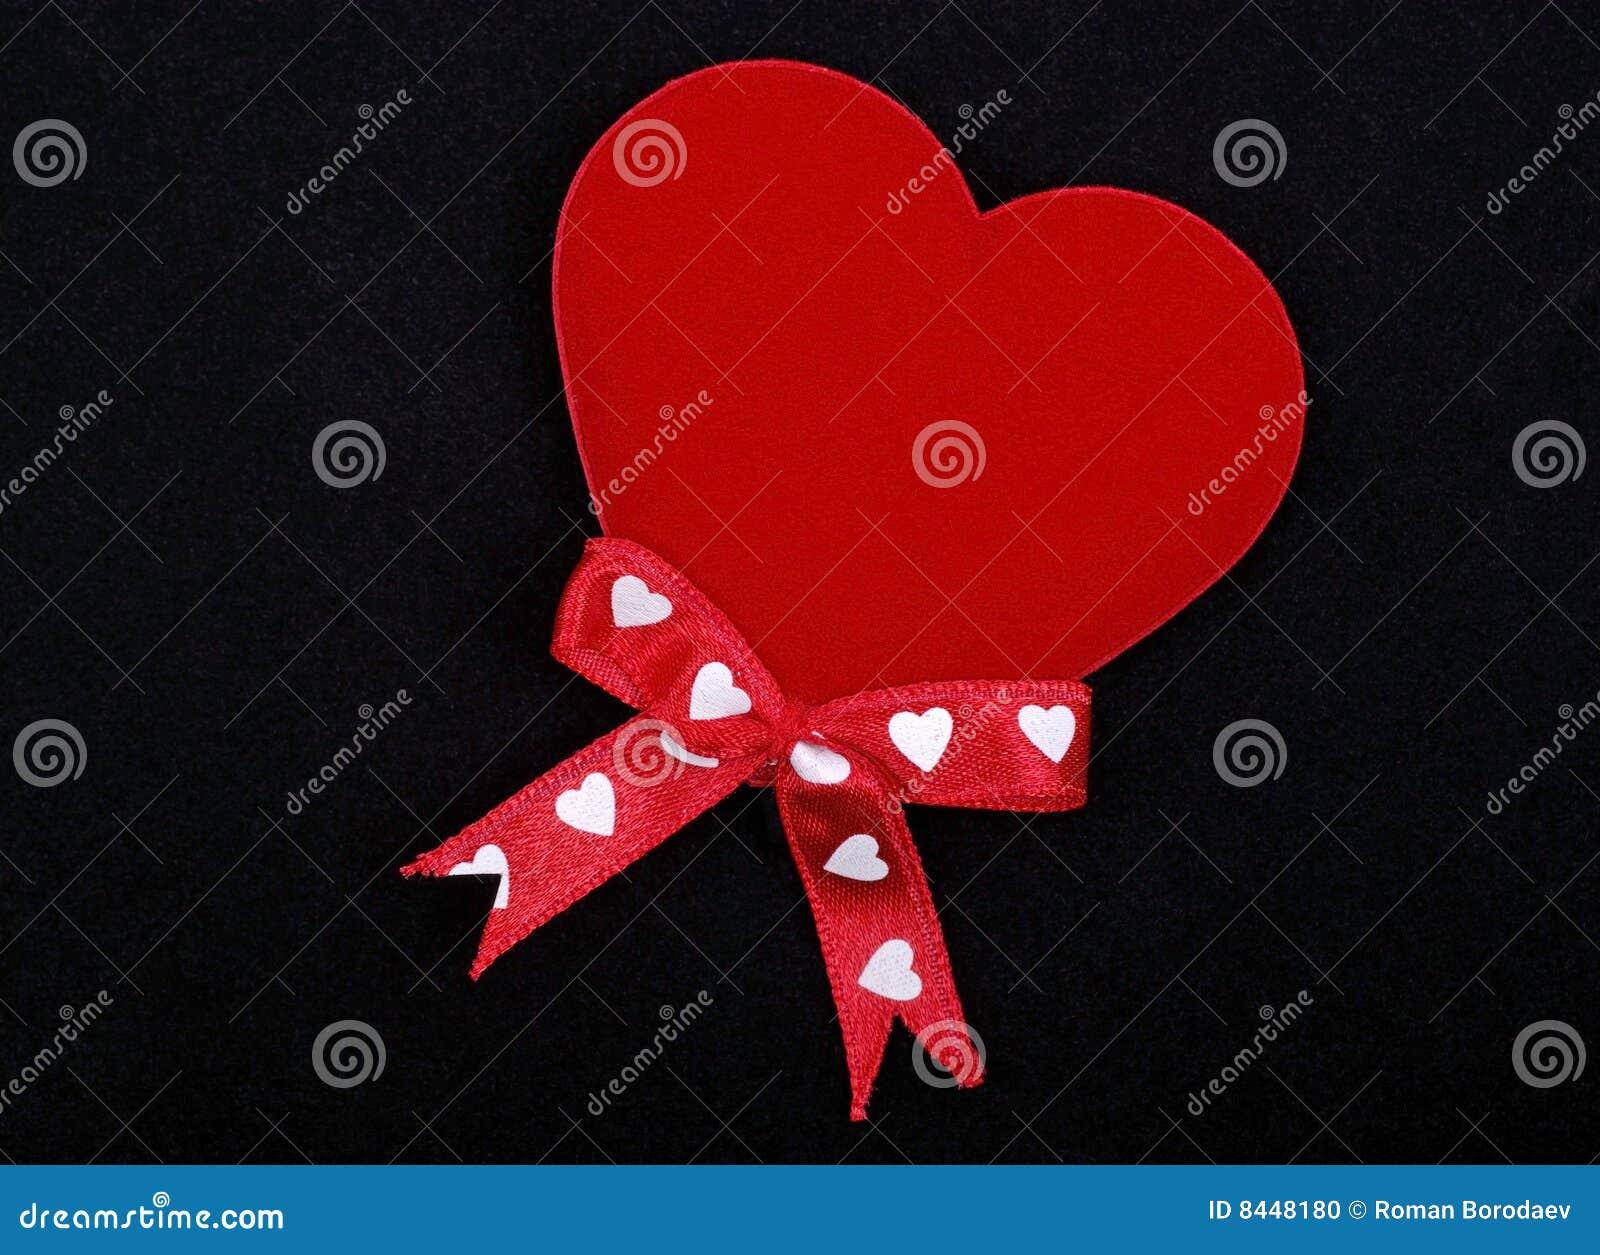 Macro of red heart